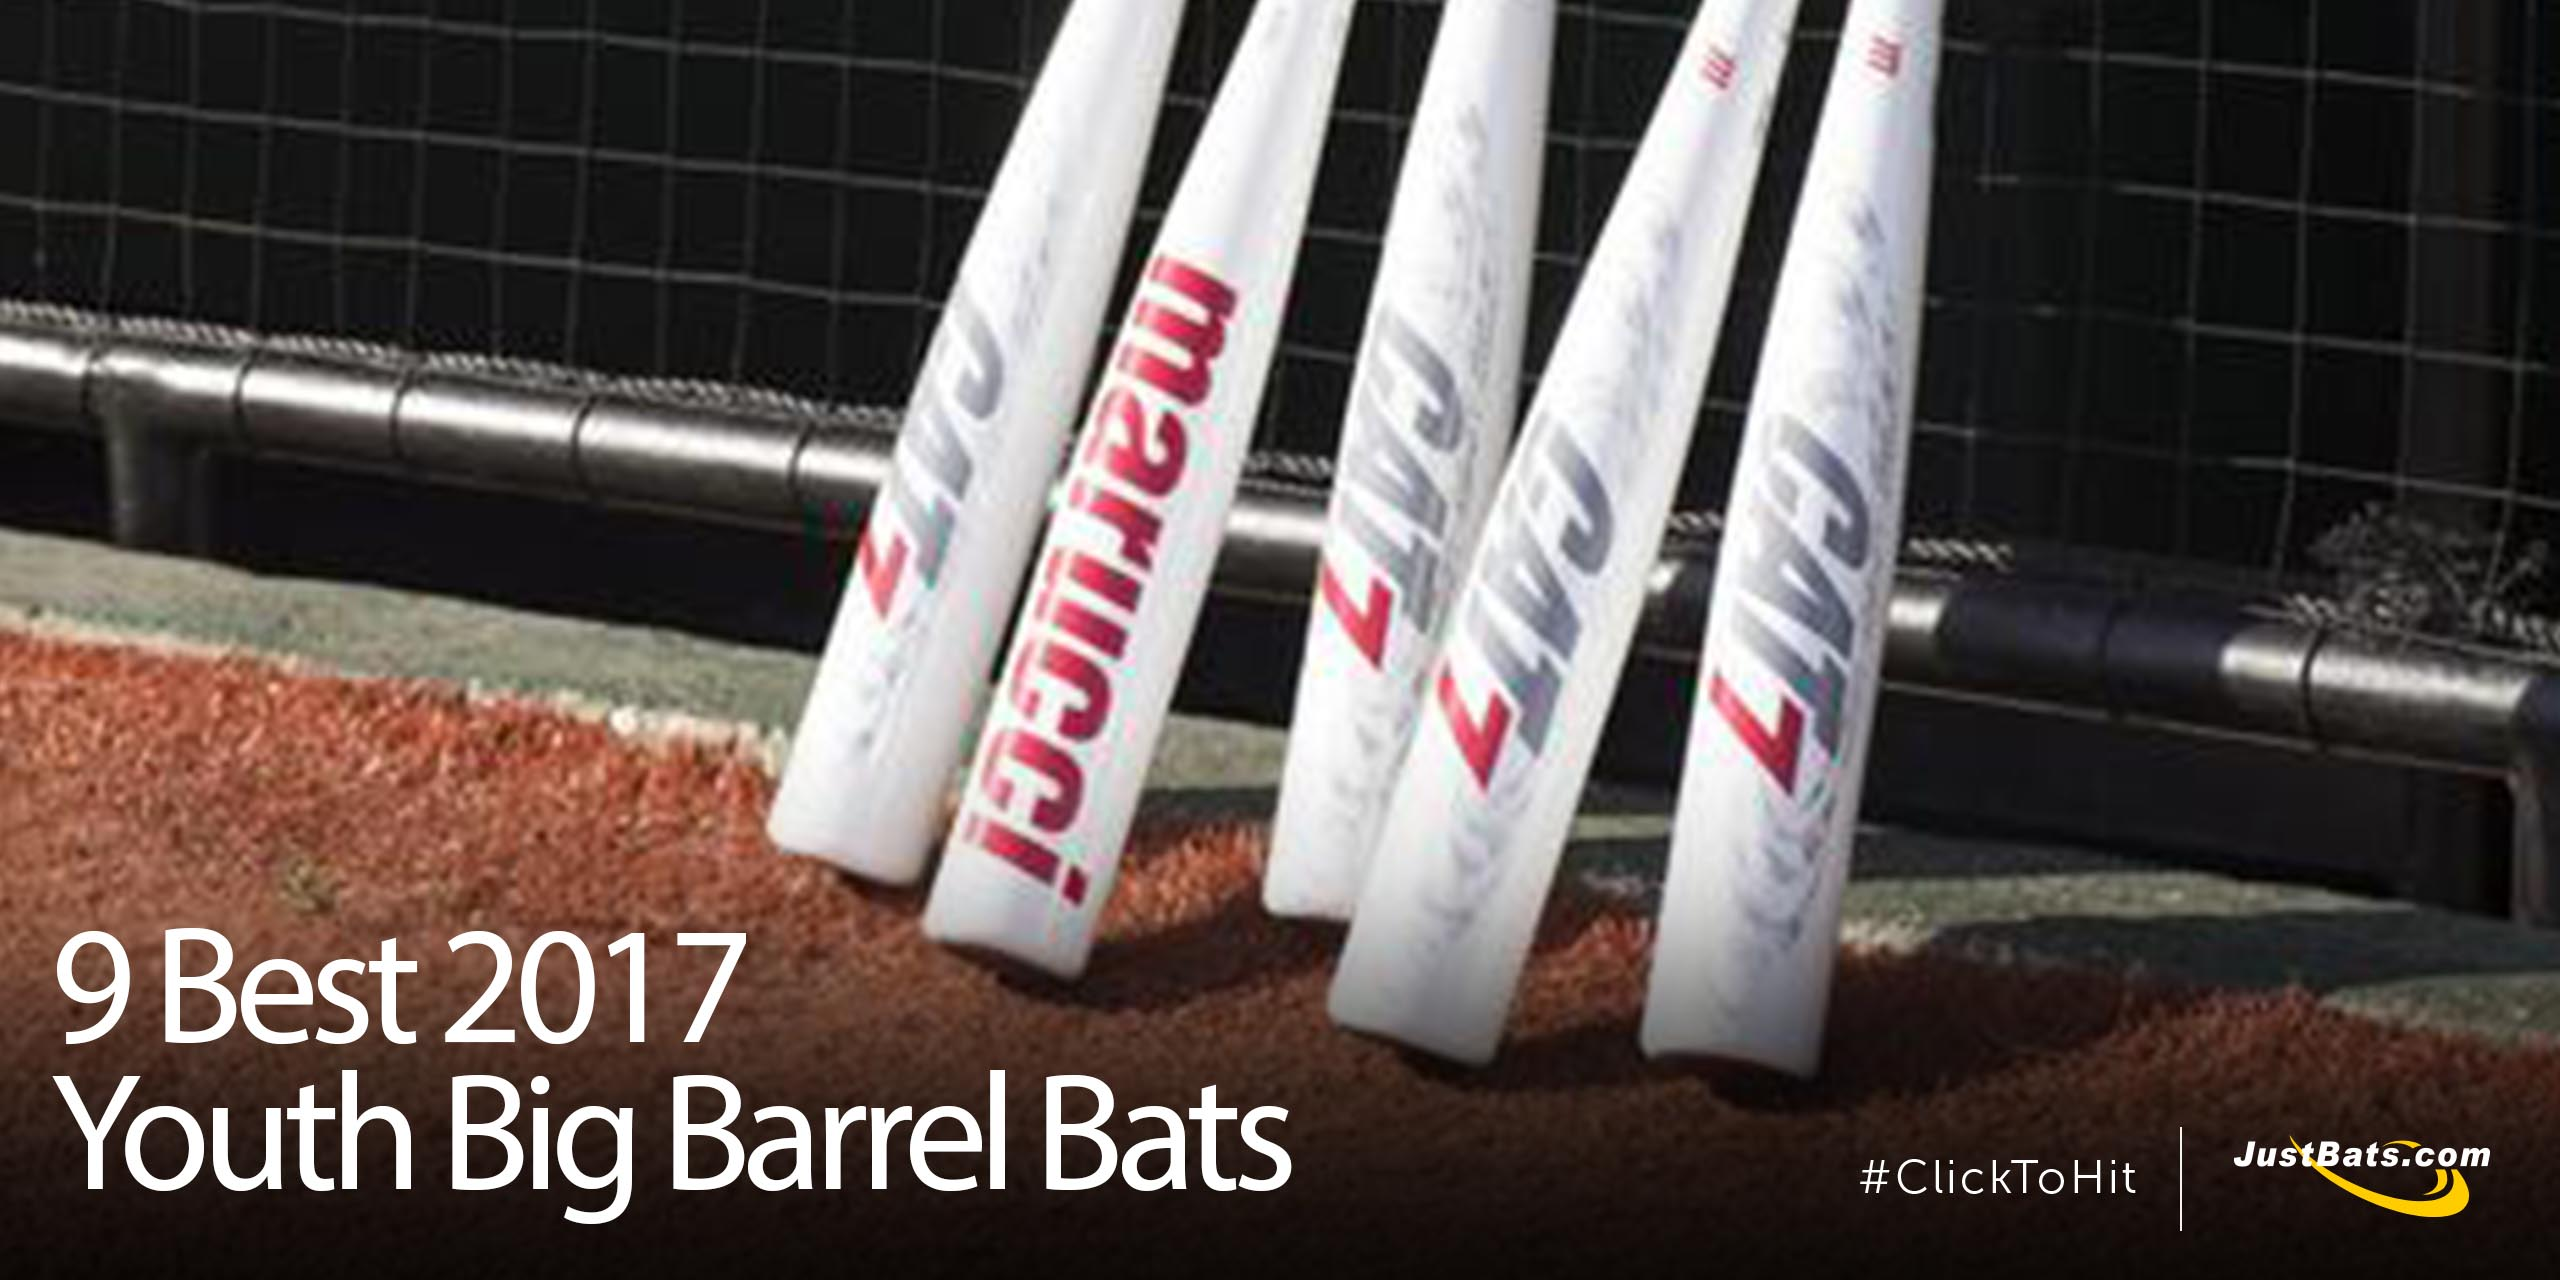 9 Best 2017 Youth Big Barrel Bats - Blog-1.jpg